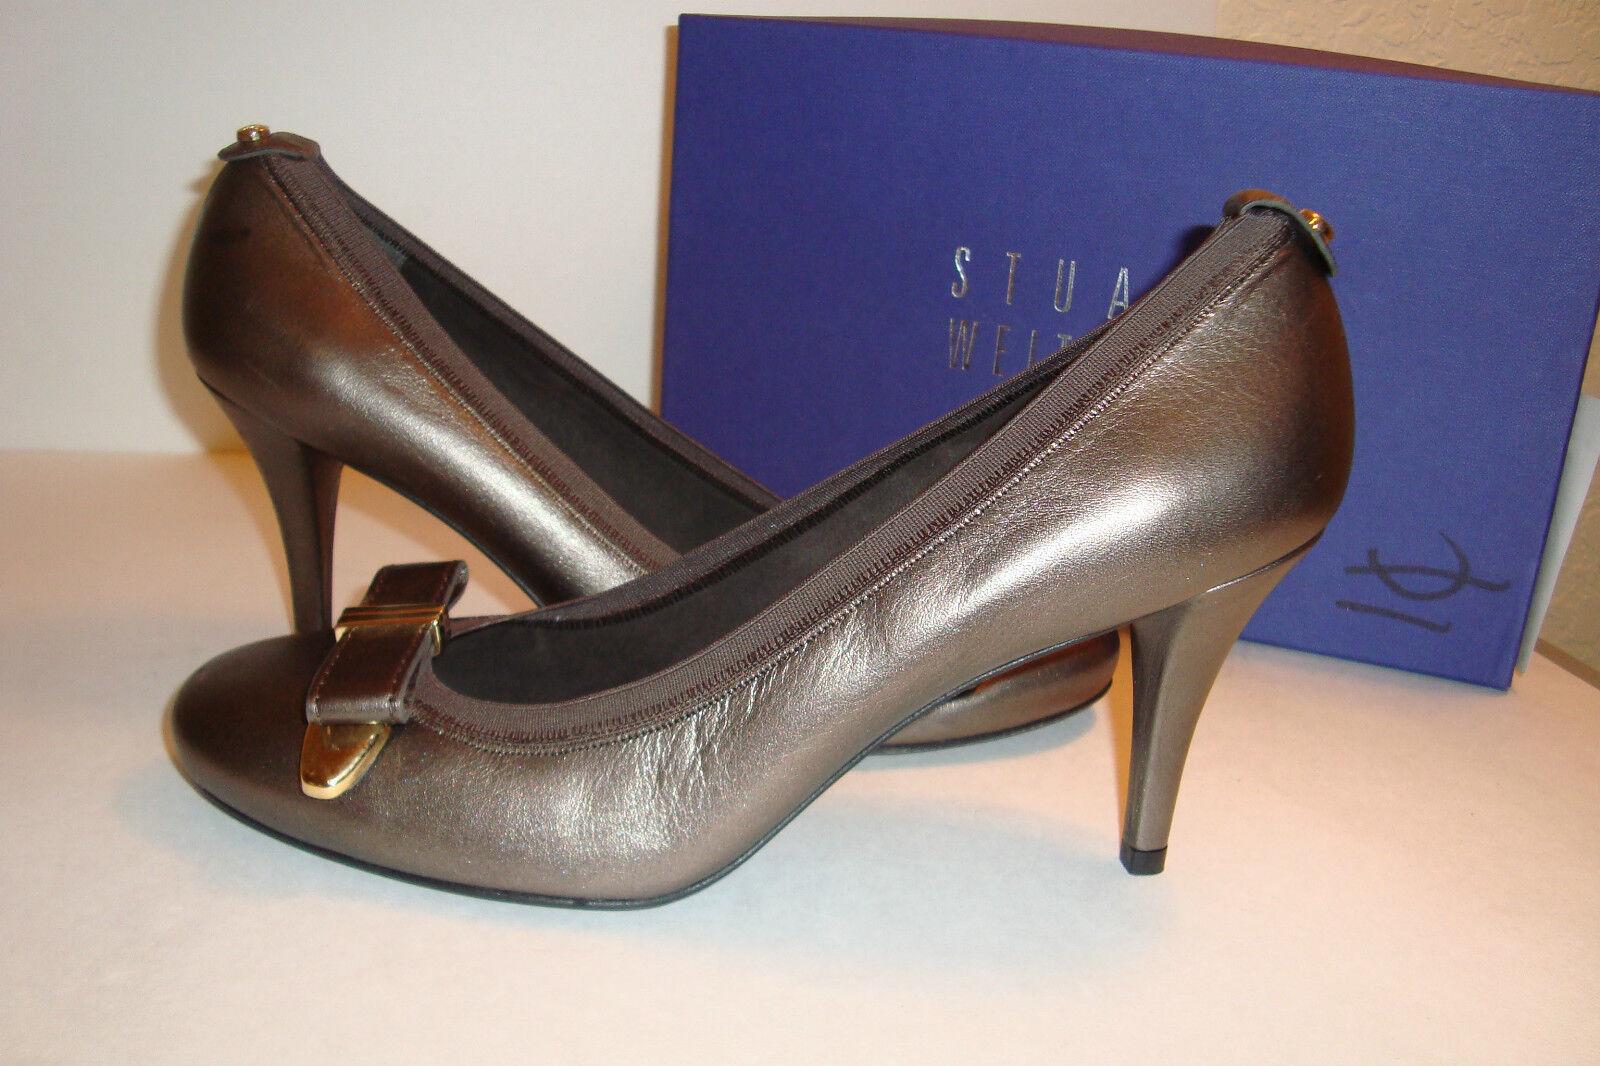 Stuart Weitzman Weitzman Stuart para mujer-Sepia Mordore Bronce Tacones Zapatos 10.5 Med pantalla 4a235c